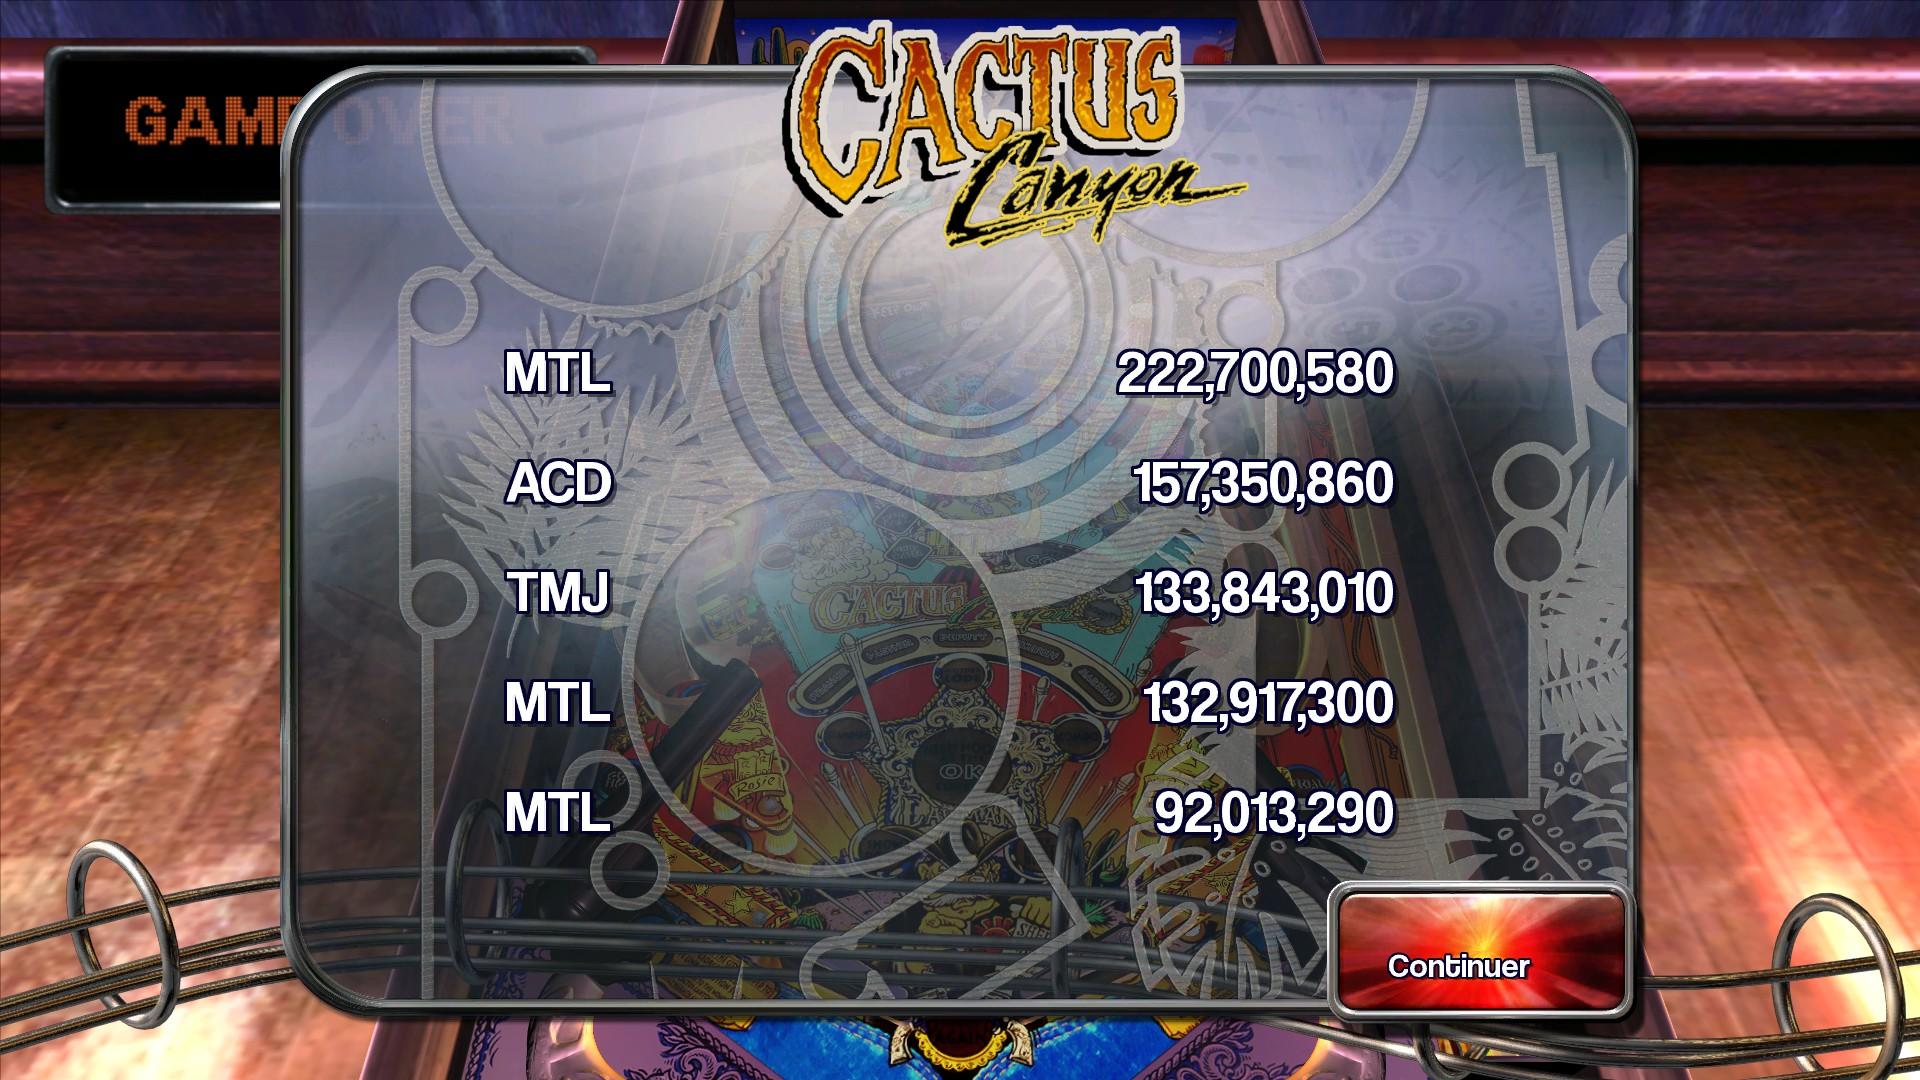 Mantalow: Pinball Arcade: Cactus Canyon (PC) 222,700,580 points on 2015-06-29 17:12:48